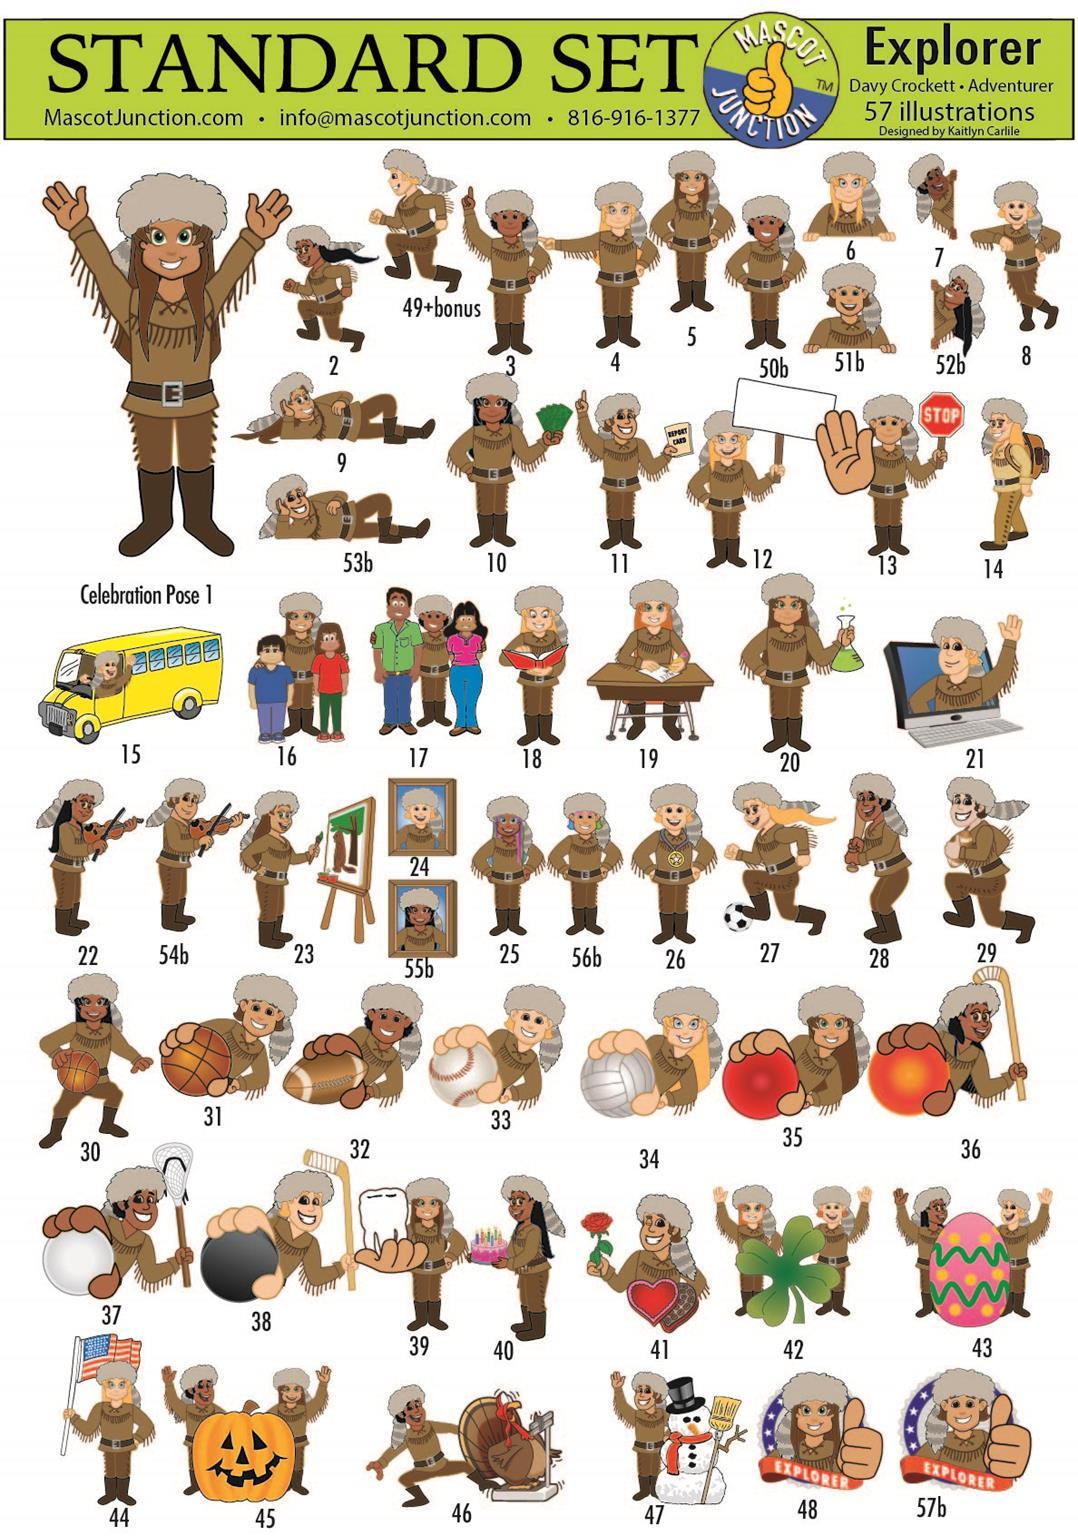 Explorer Pioneer Trailblazer mascot clip art